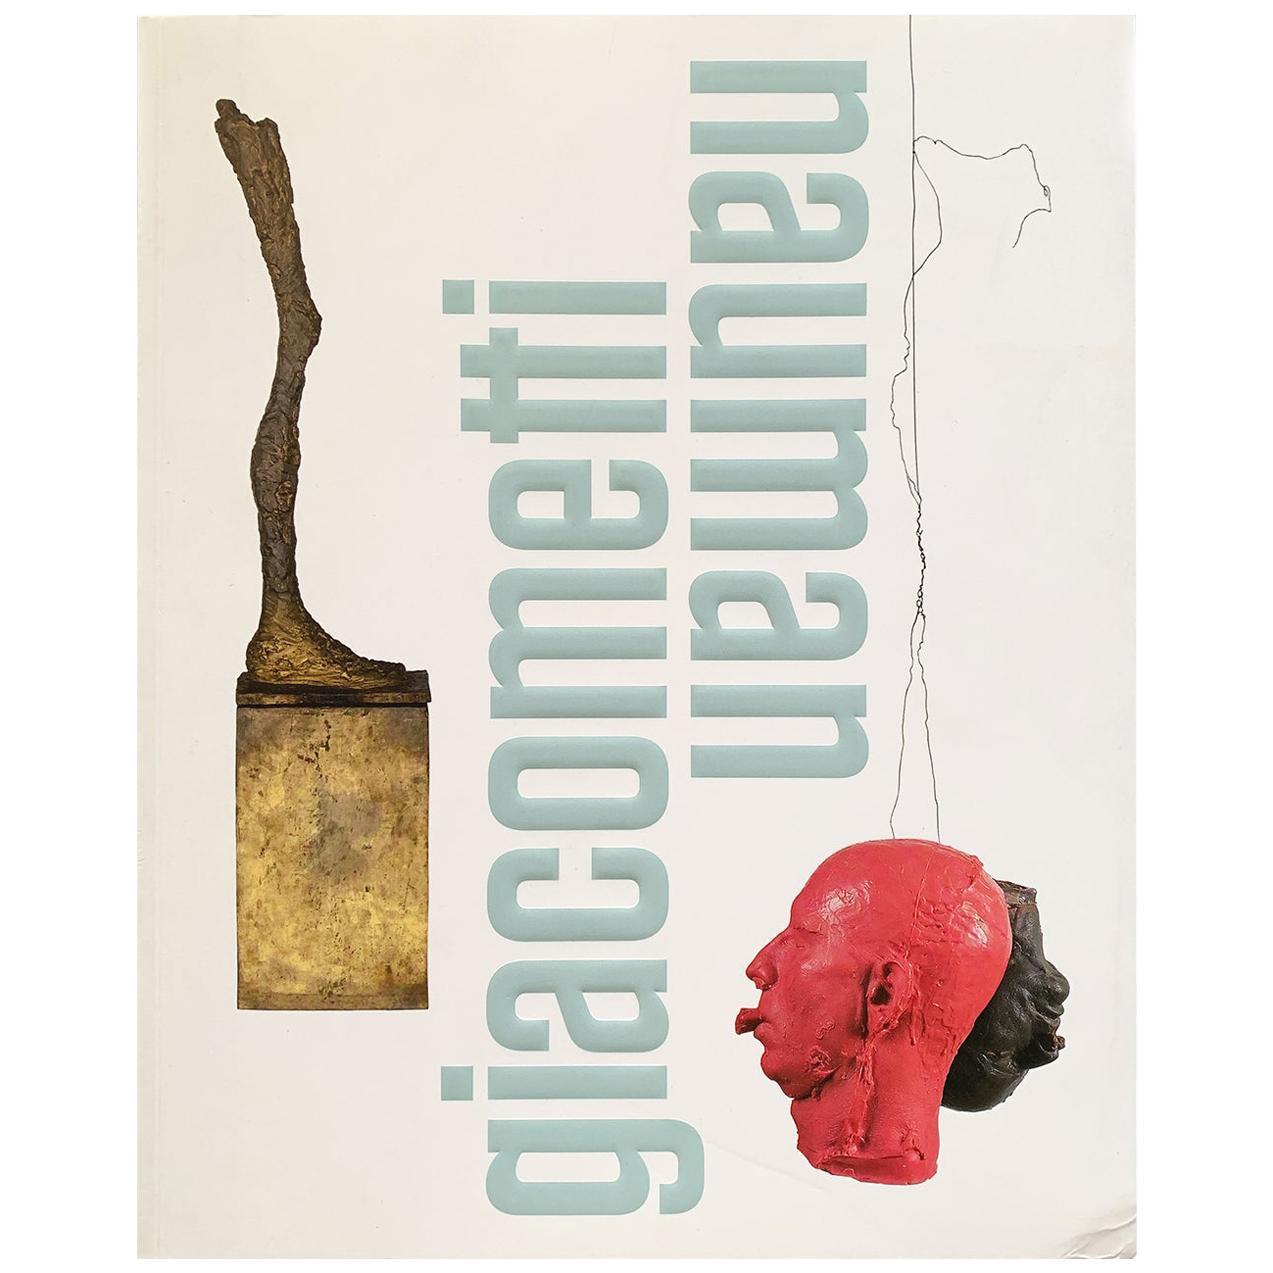 Alberto Giacometti and Bruce Nauman Exhibition Catalogue